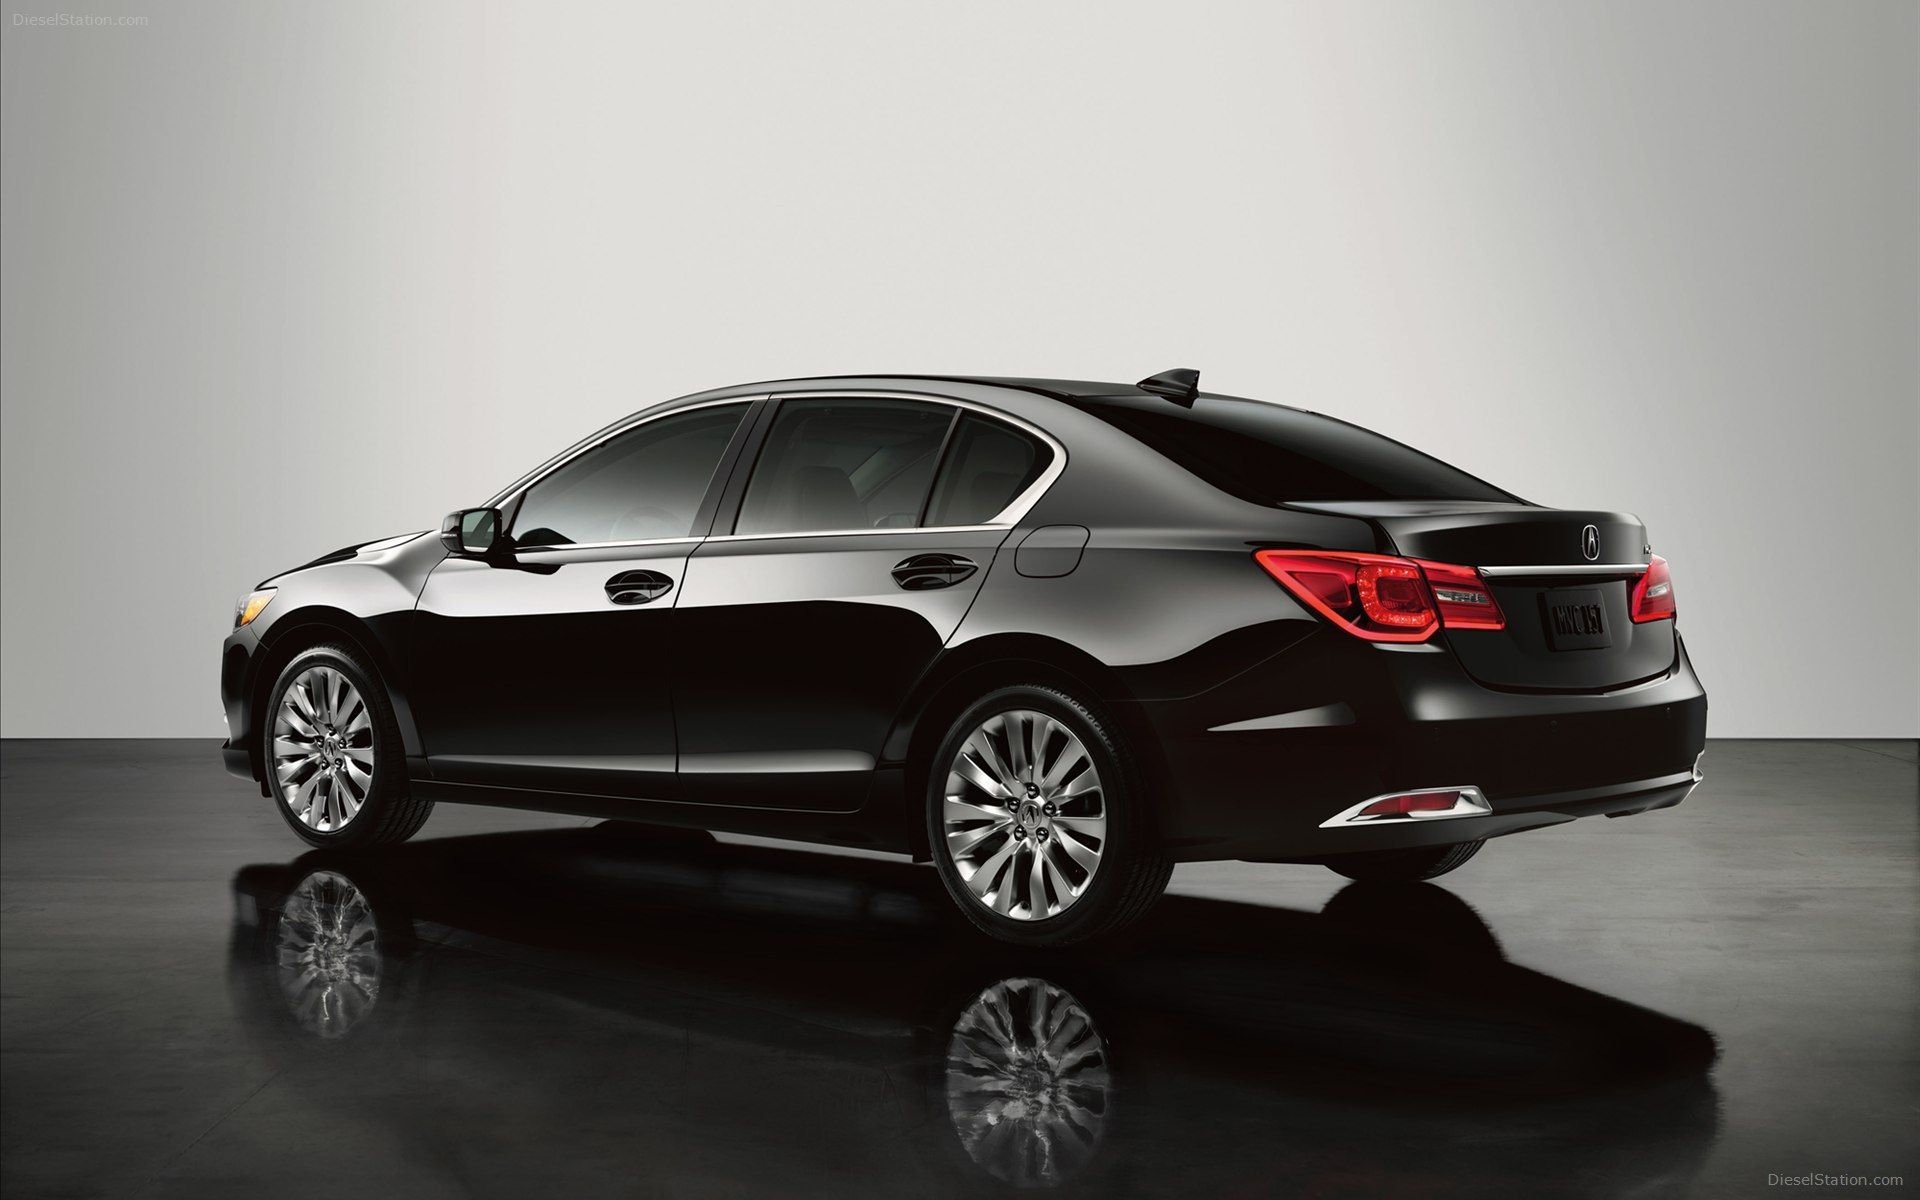 2014 Acura RLX Black Rear Wallpaper